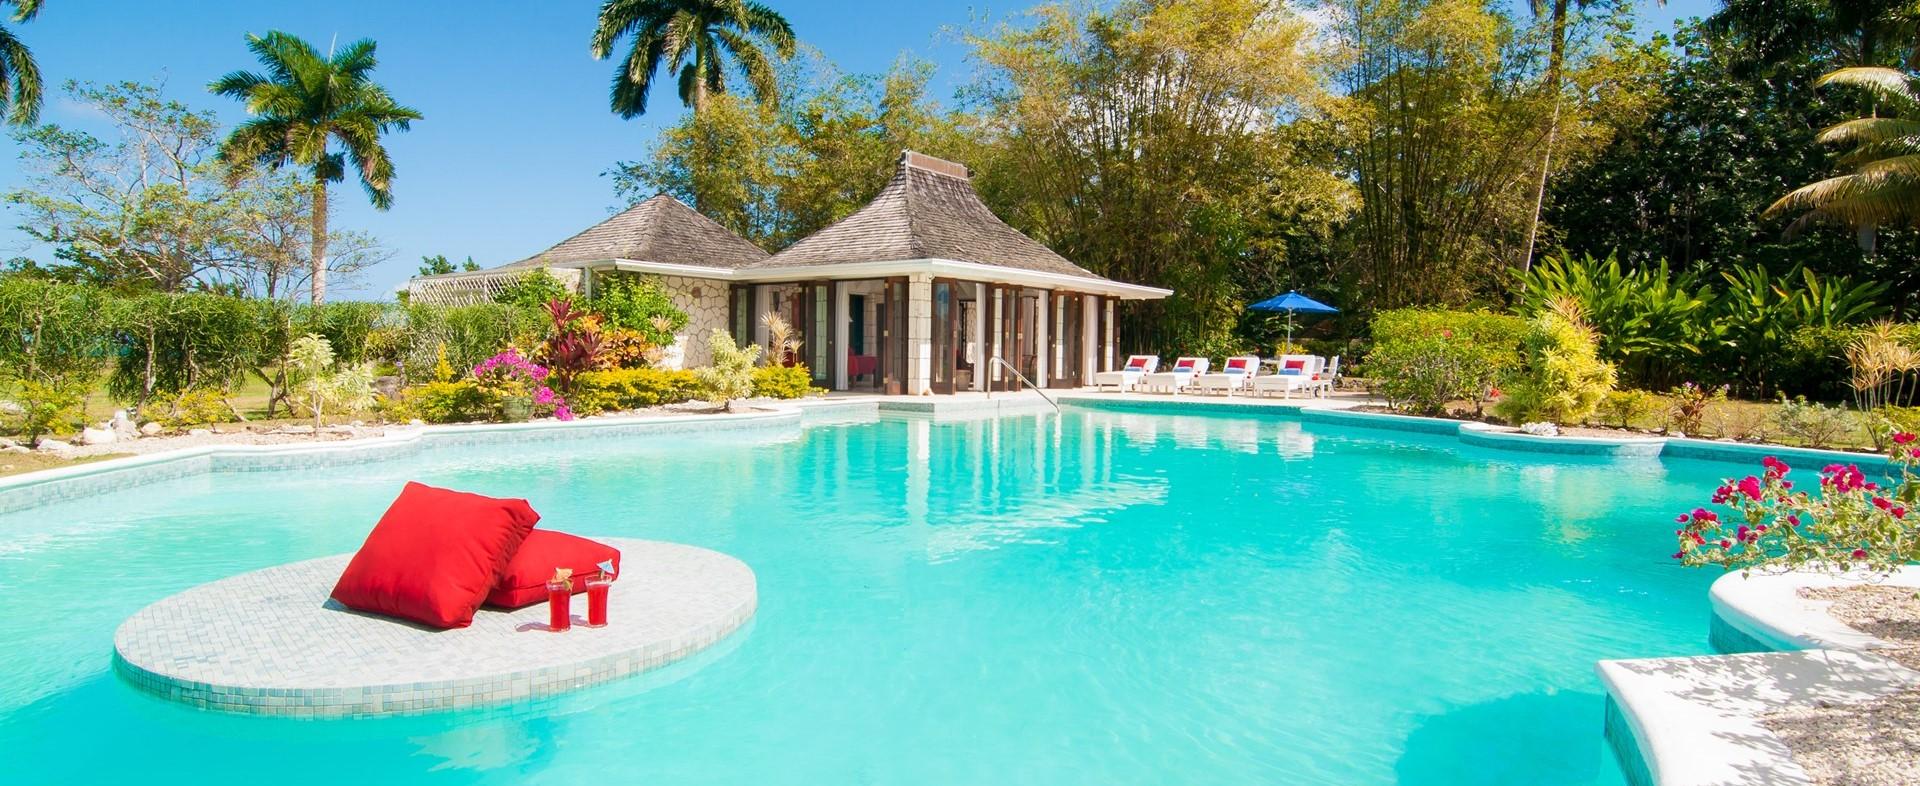 noble-house-villa-jamaica-pool